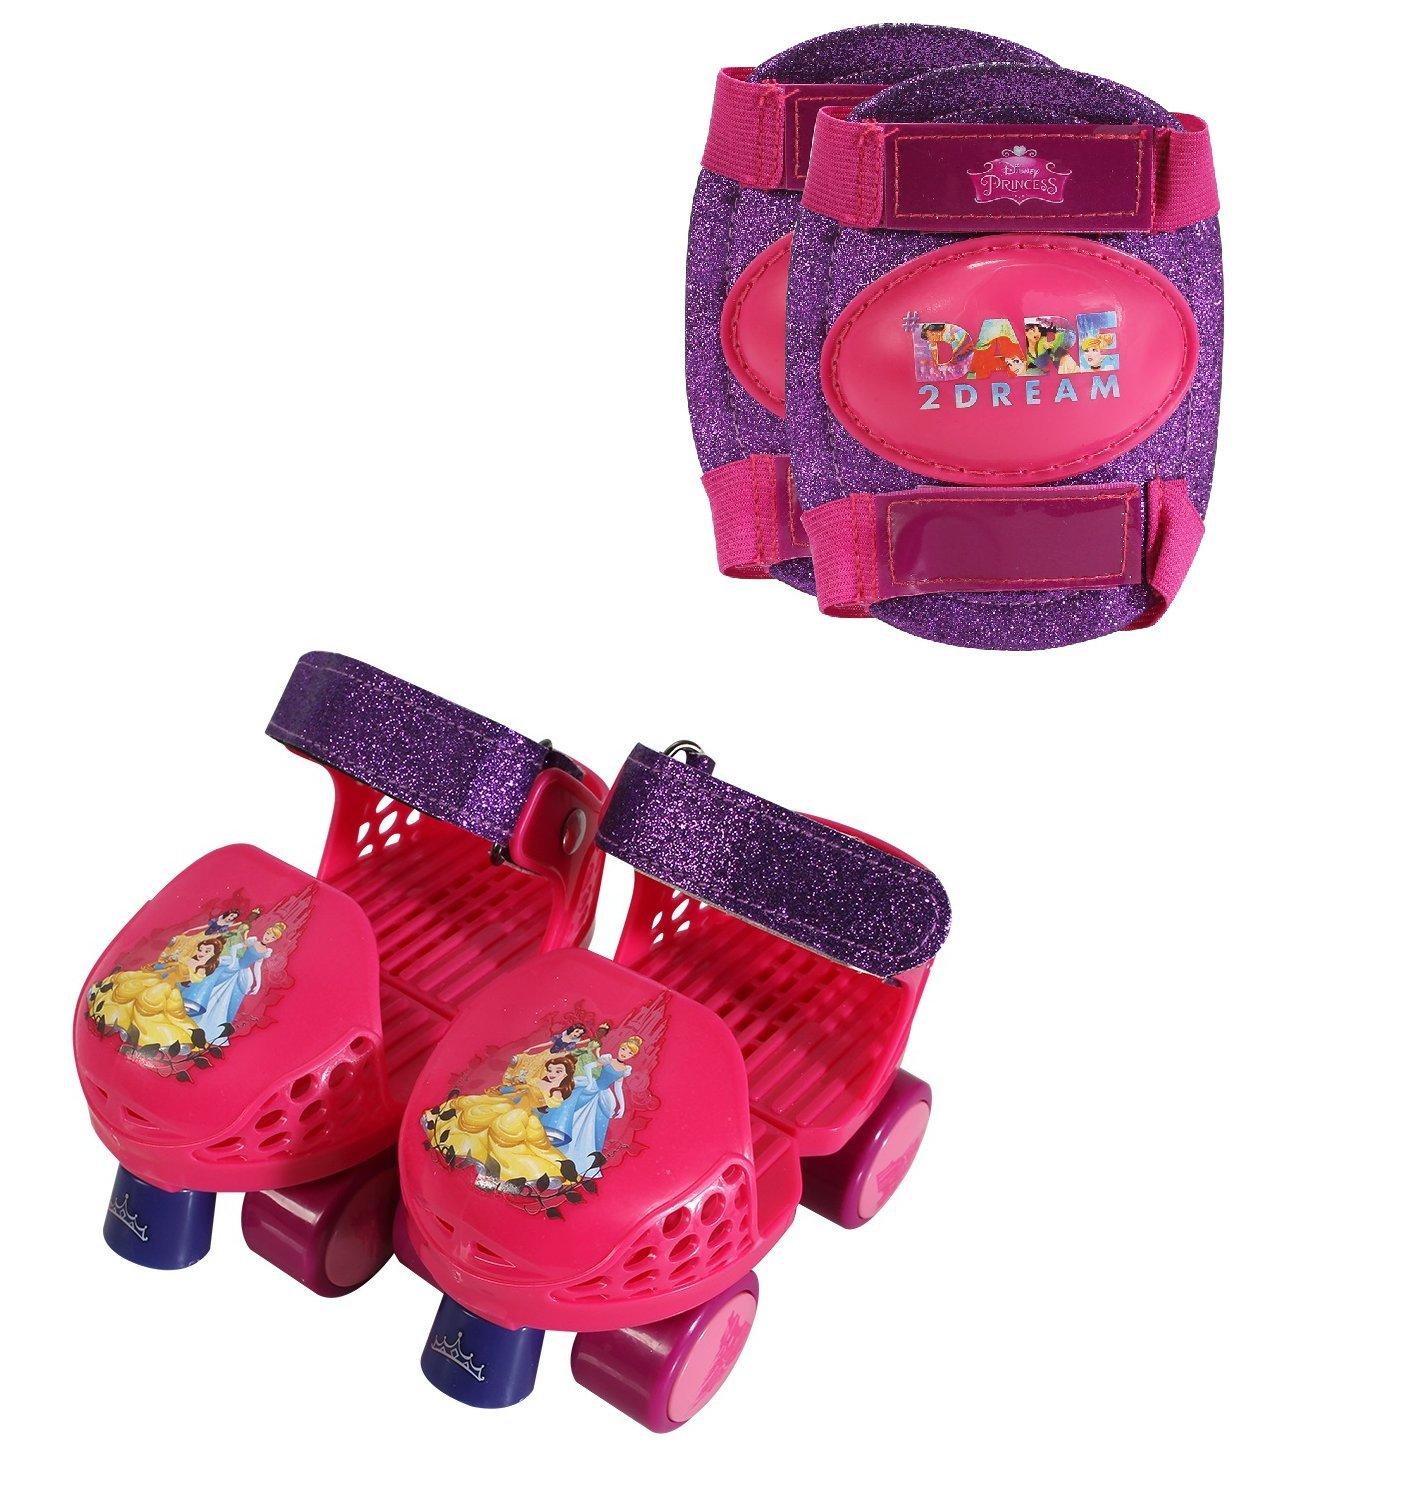 PlayWheels Disney Princess Kids Glitter Rollerskate Junior Size 6-12 with Knee Pads